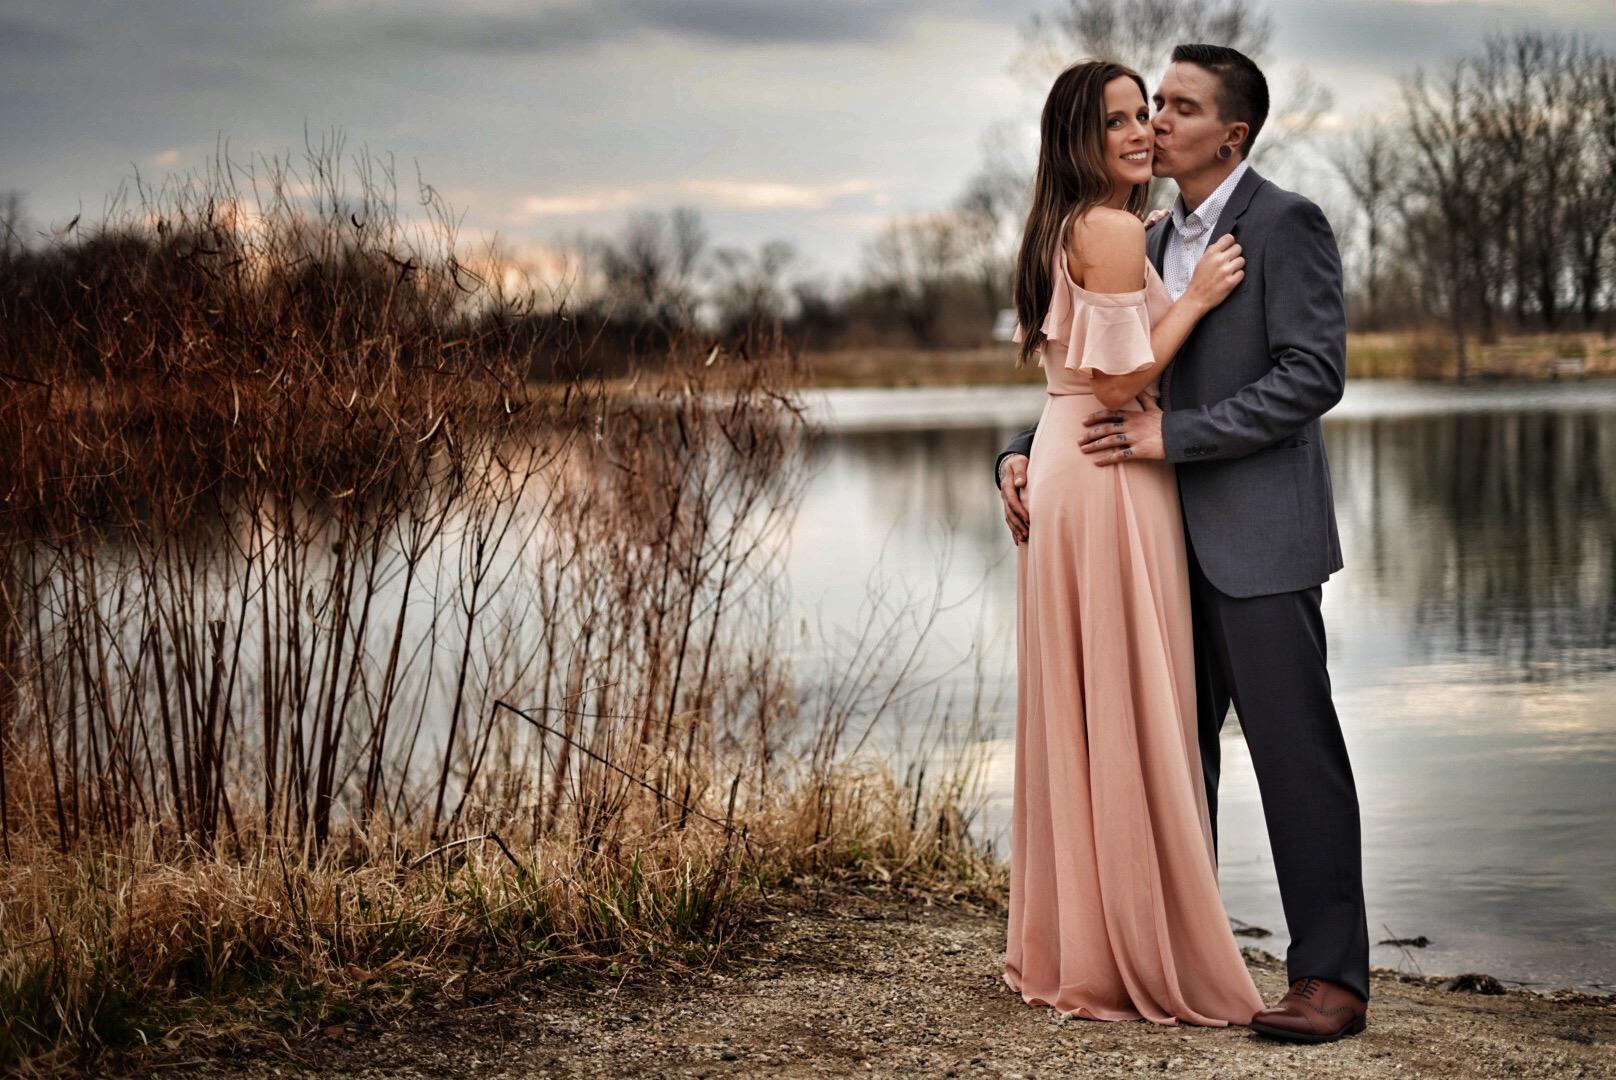 chicago-illinois-outdoors-lake-reflections-engagement-photo-shoot-pink-dress.jpeg